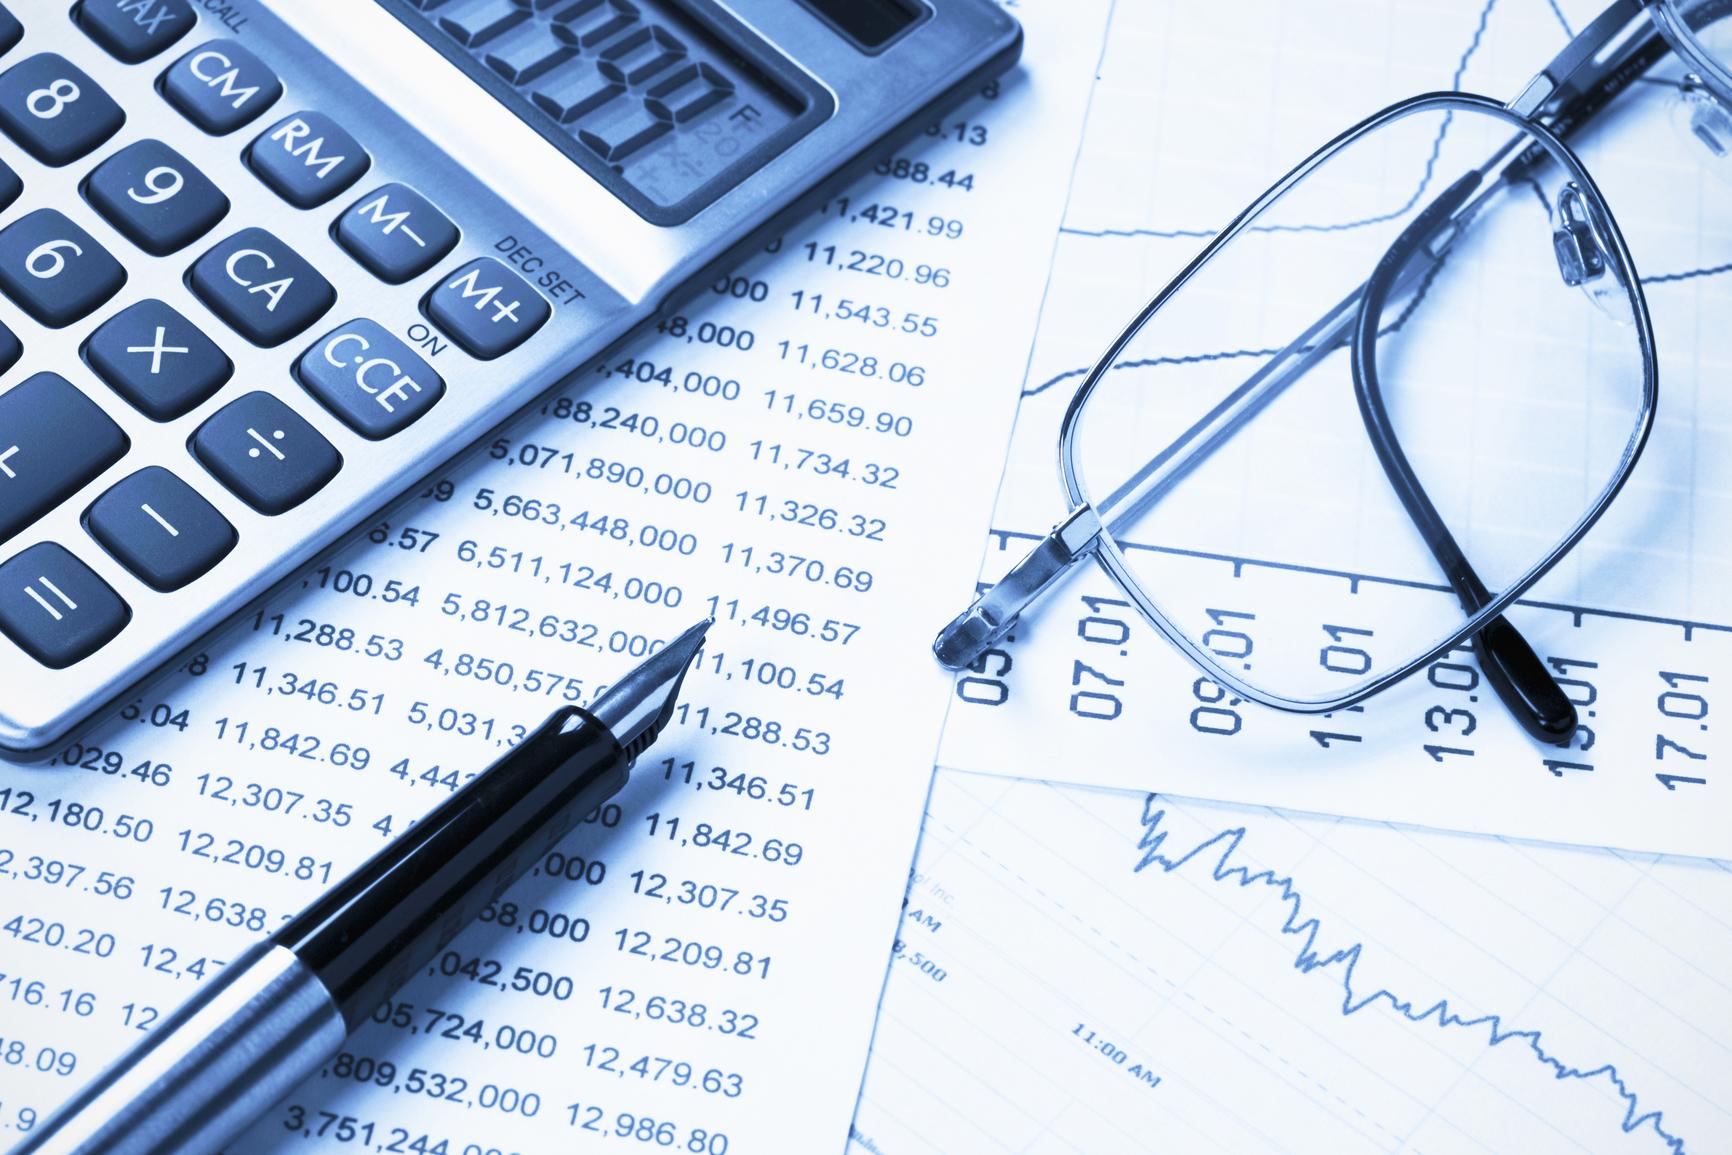 Muhasebe_is_ilan_kariyer_basvuru_accounting